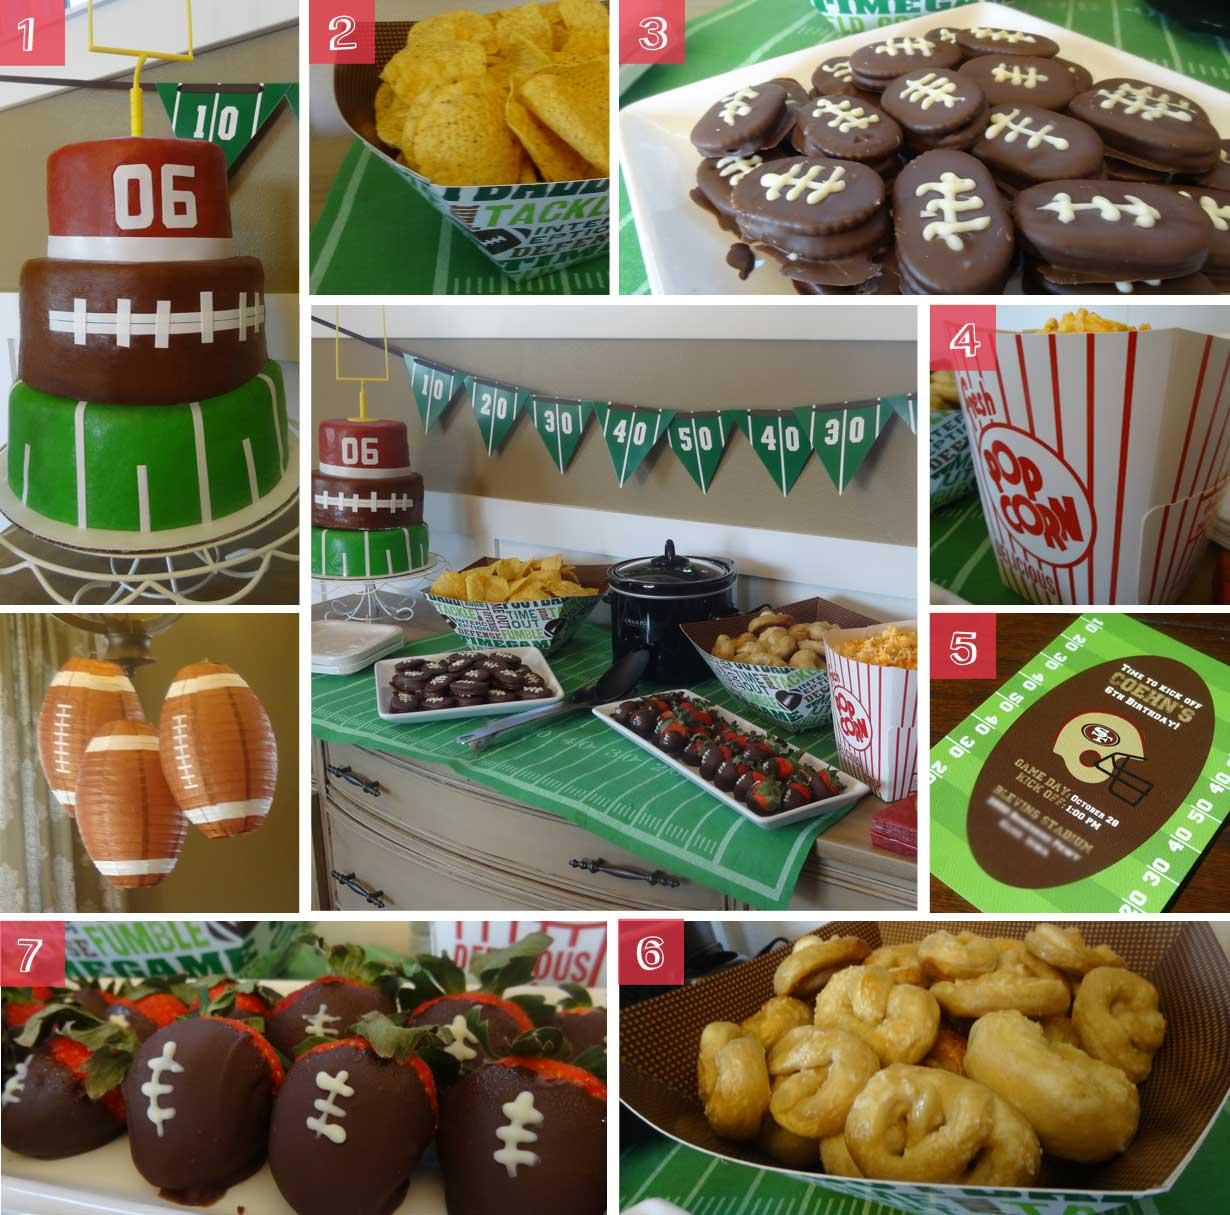 football birthday cakes at walmart 5 on football birthday cakes at walmart